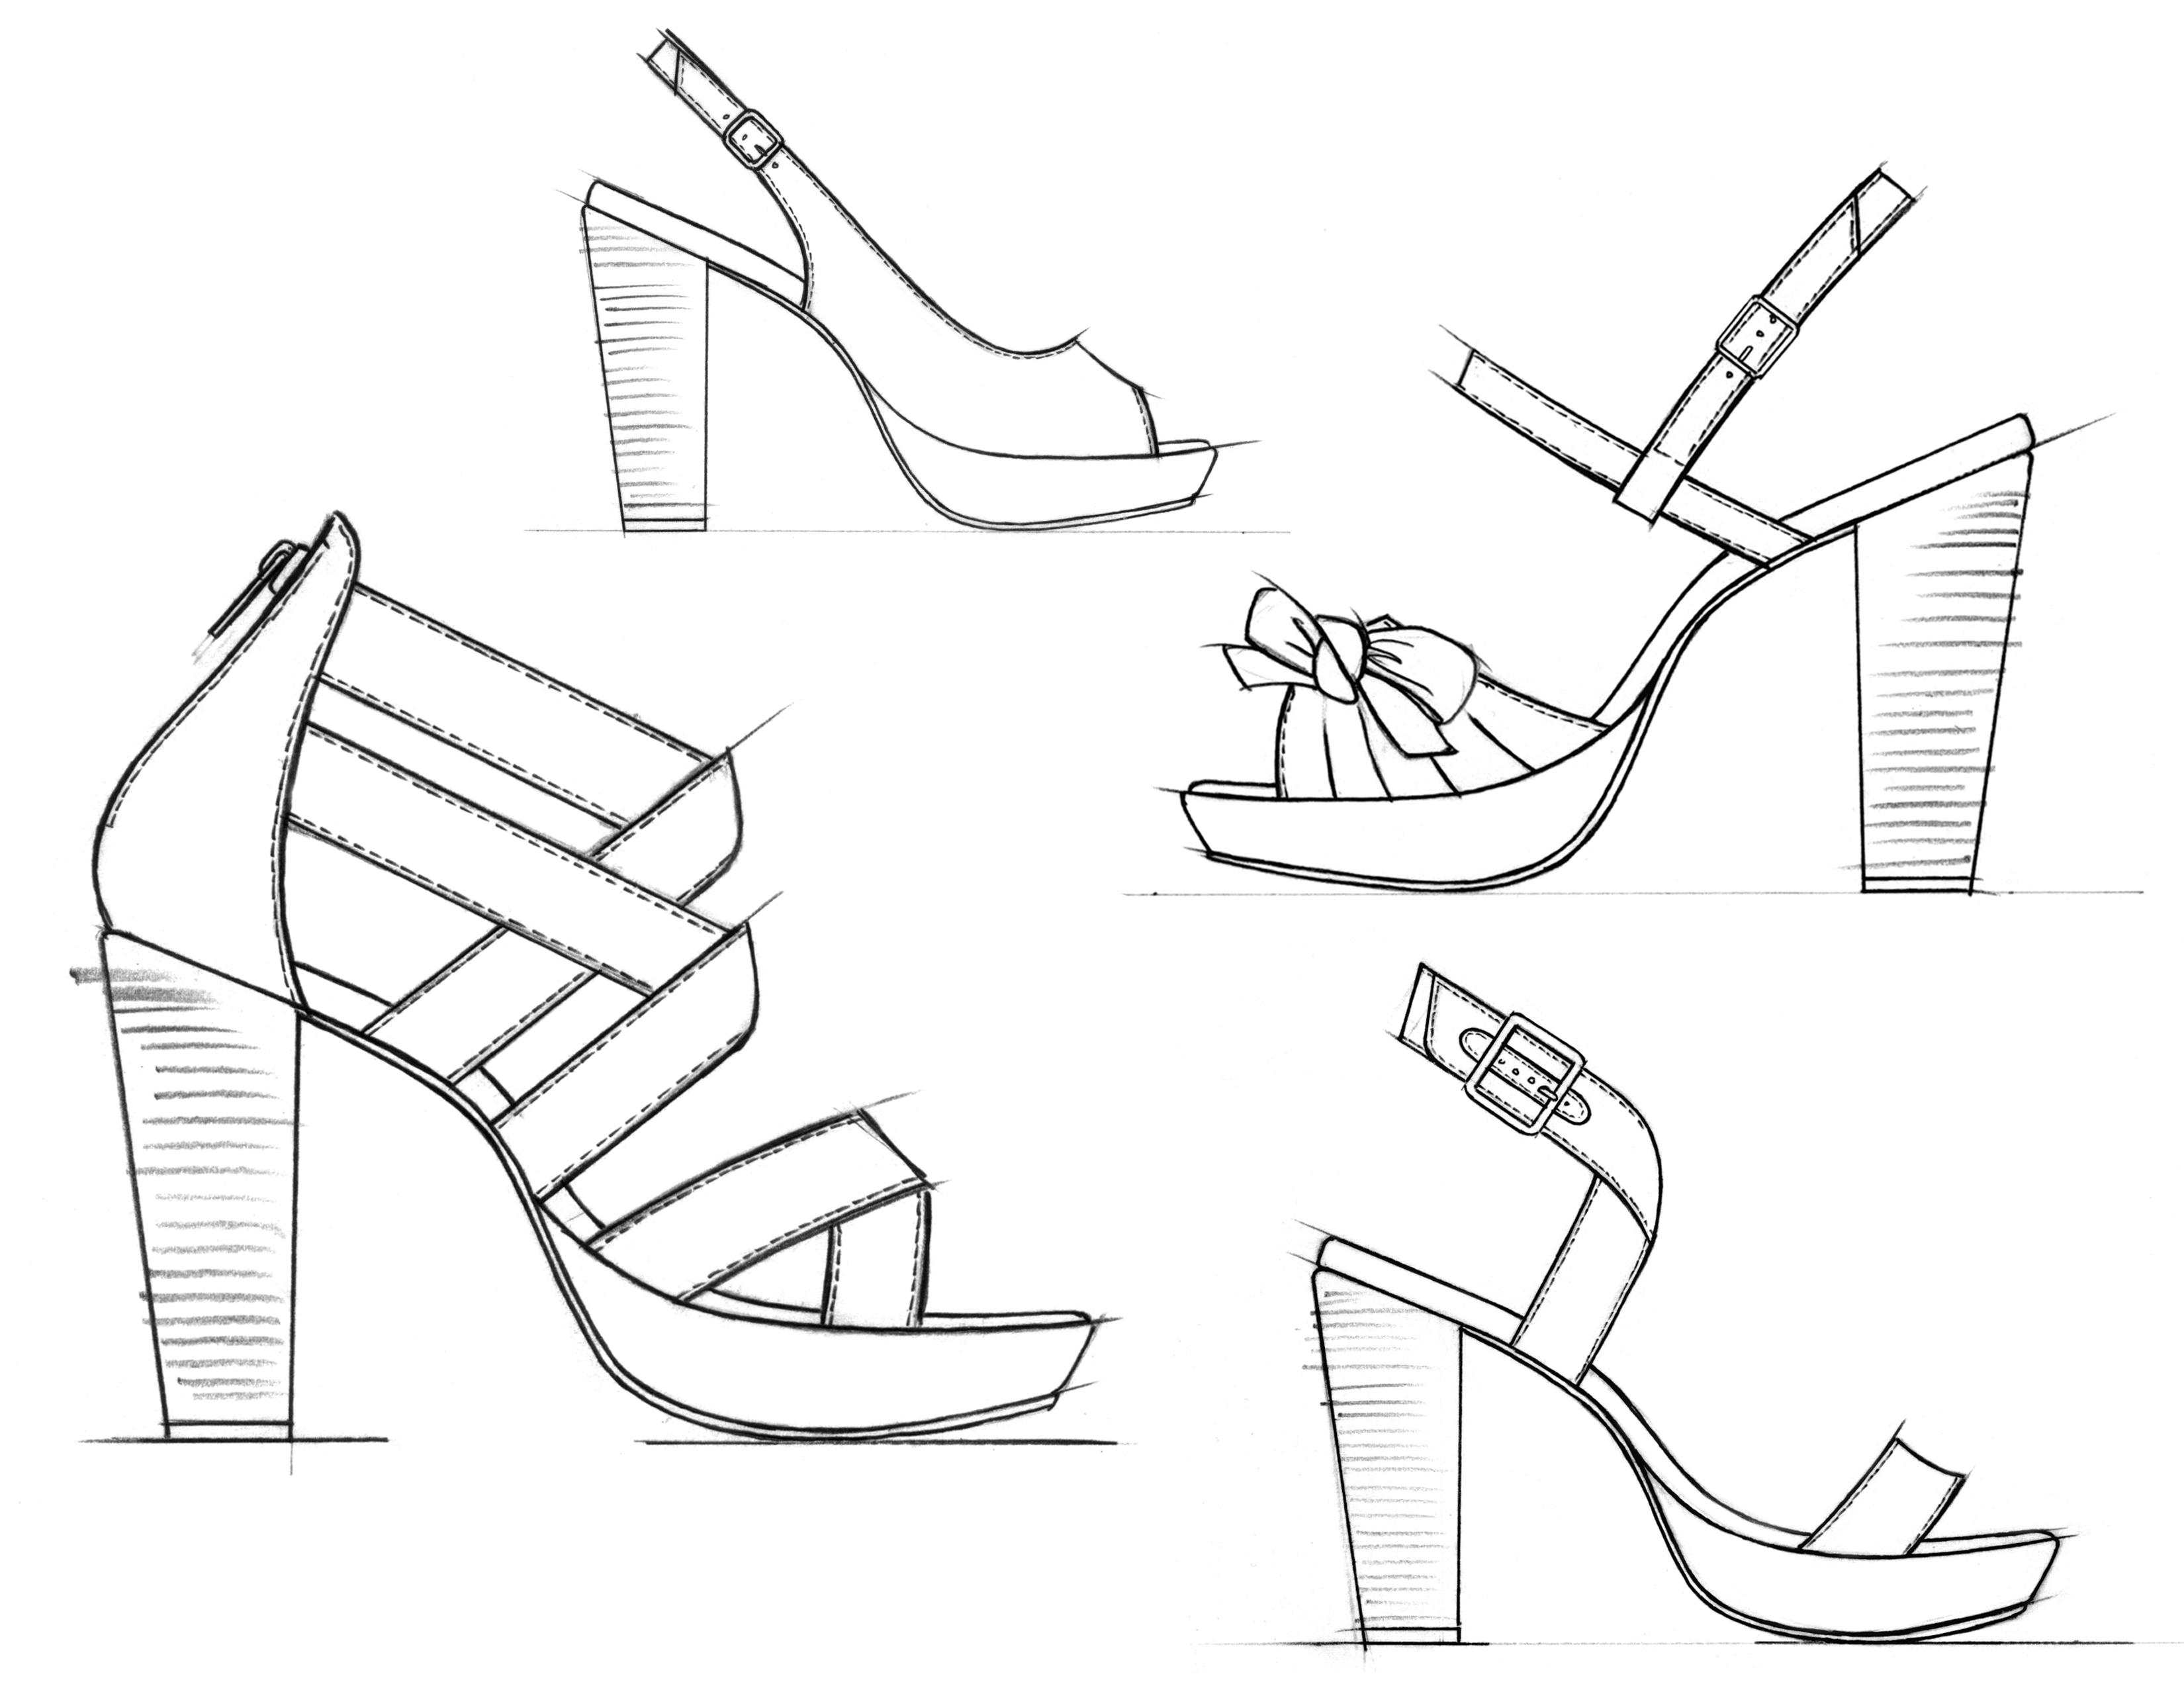 how to sketch high heels high heels sketch style vector graphics creative market heels high to sketch how